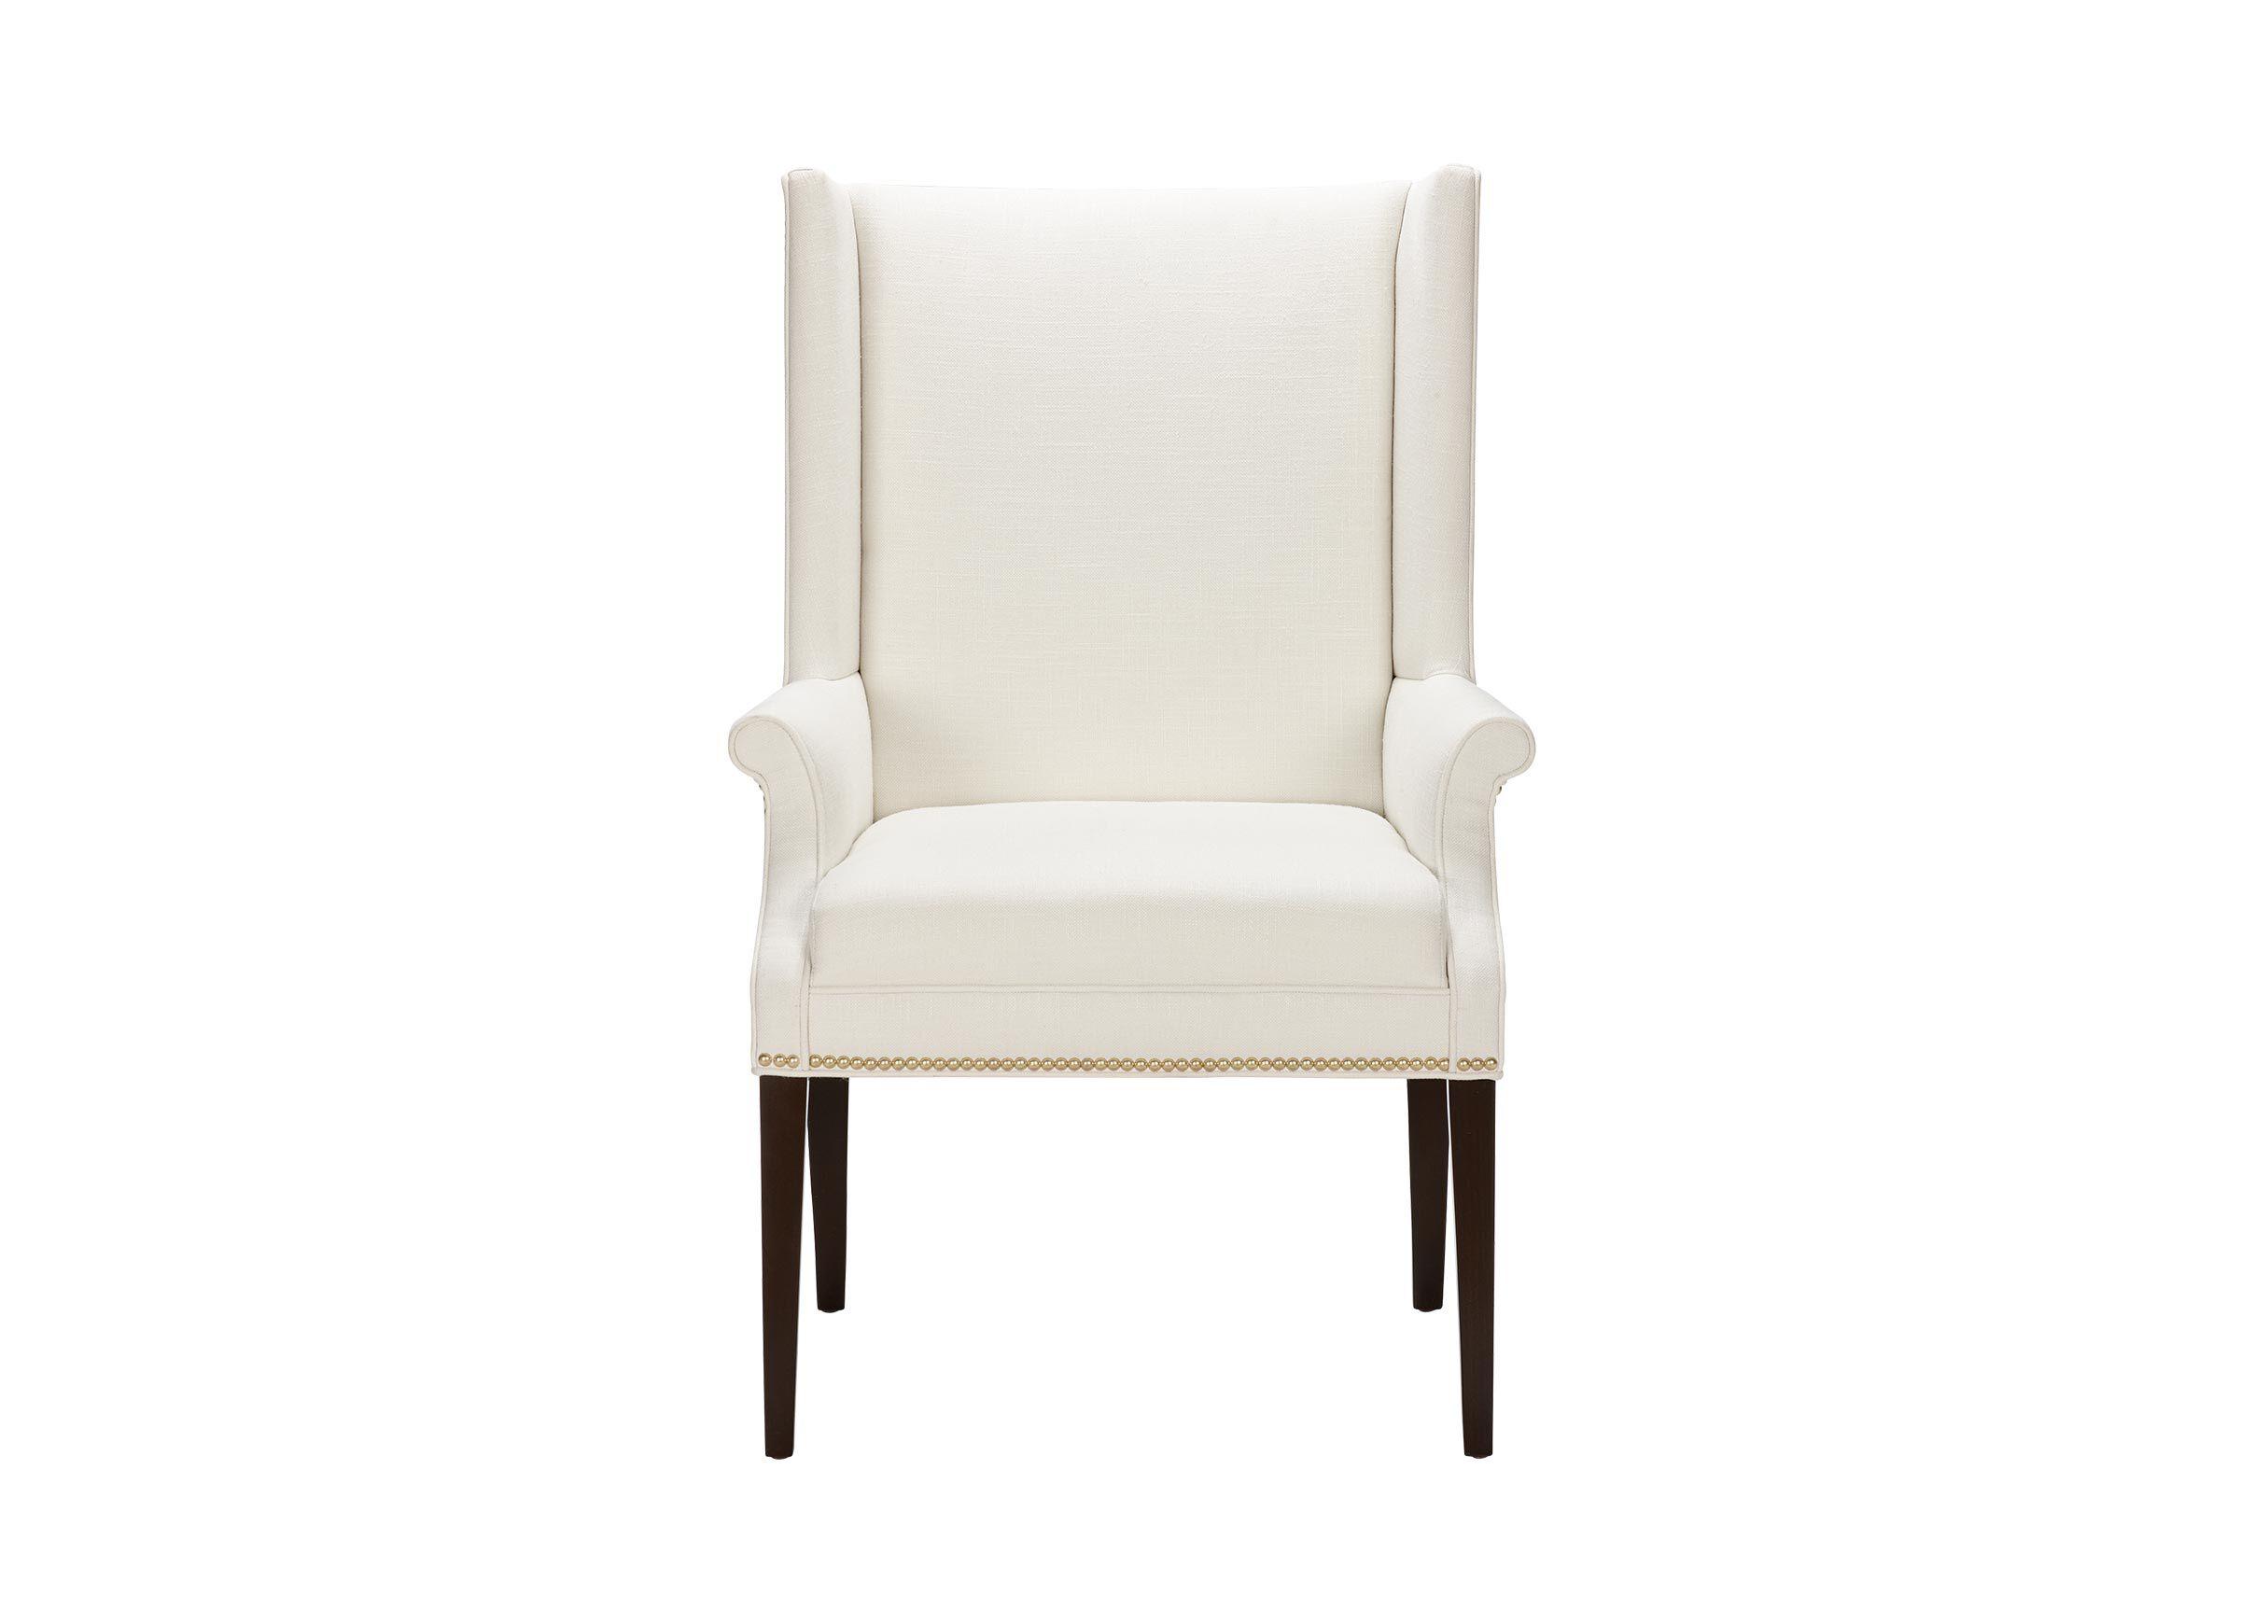 Yves Host Chairs Upholstered | Ethan Allen Dining Room Host Chairs | Ethan  Allen